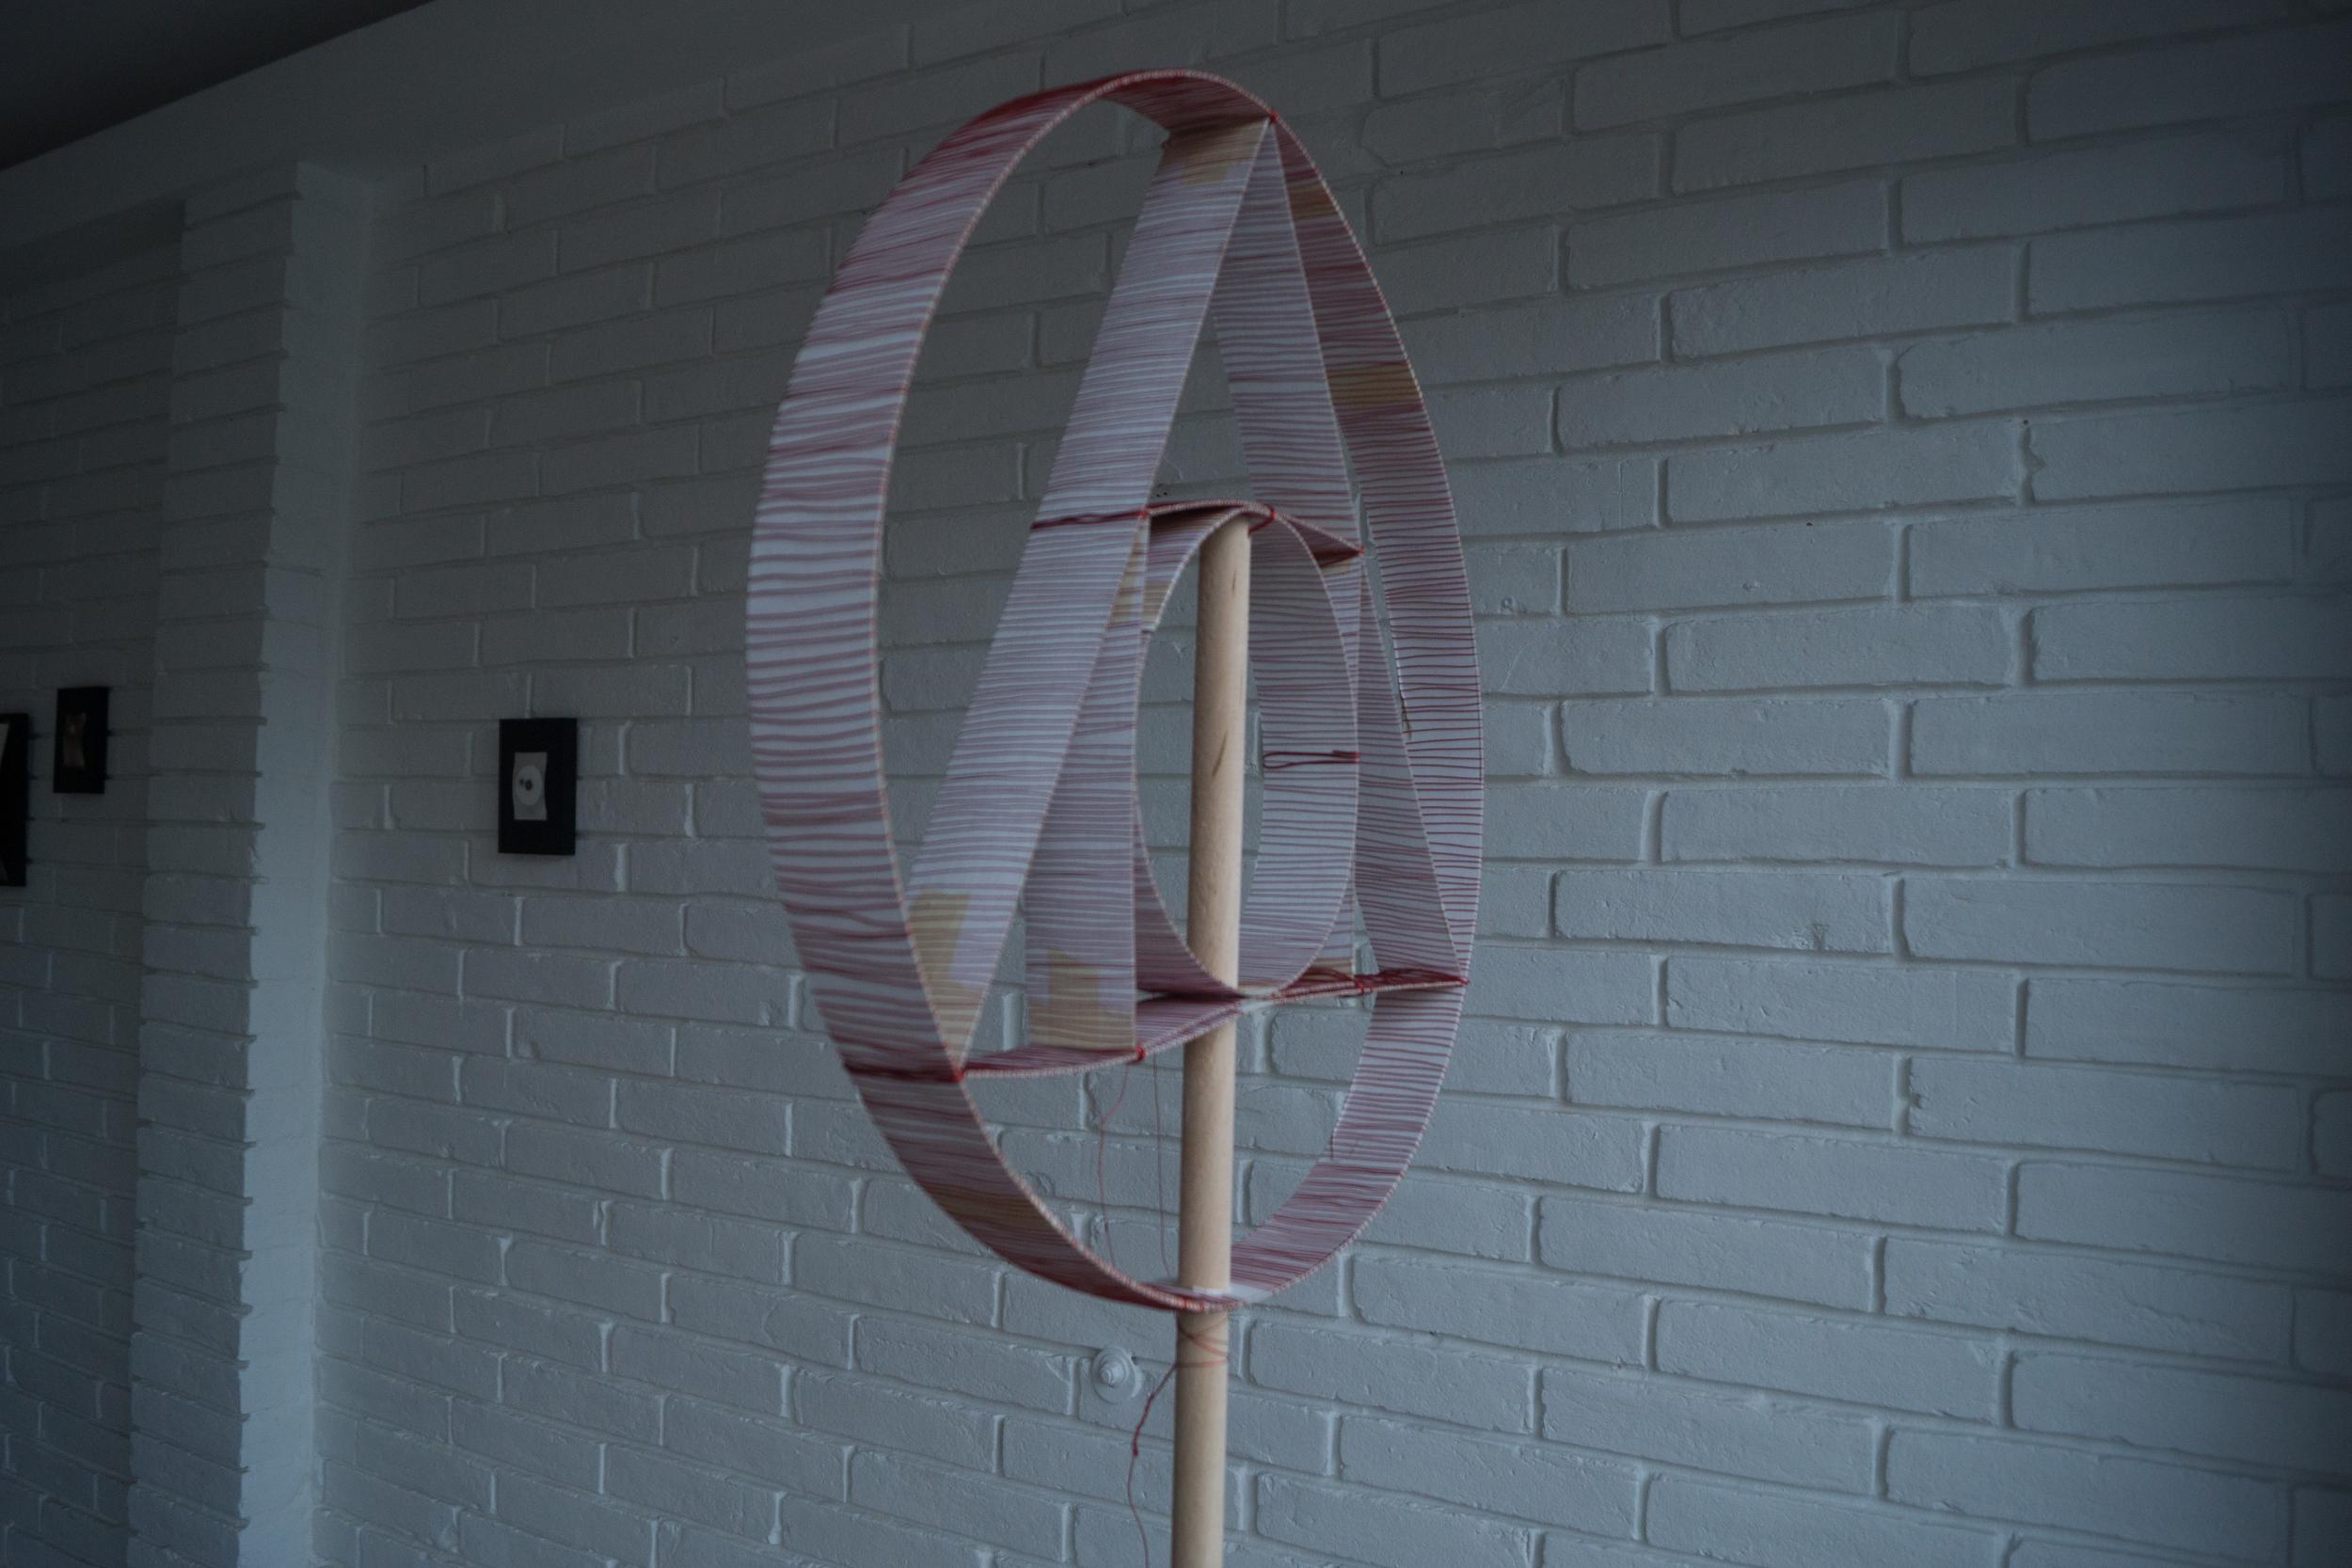 2nd Violin antenna